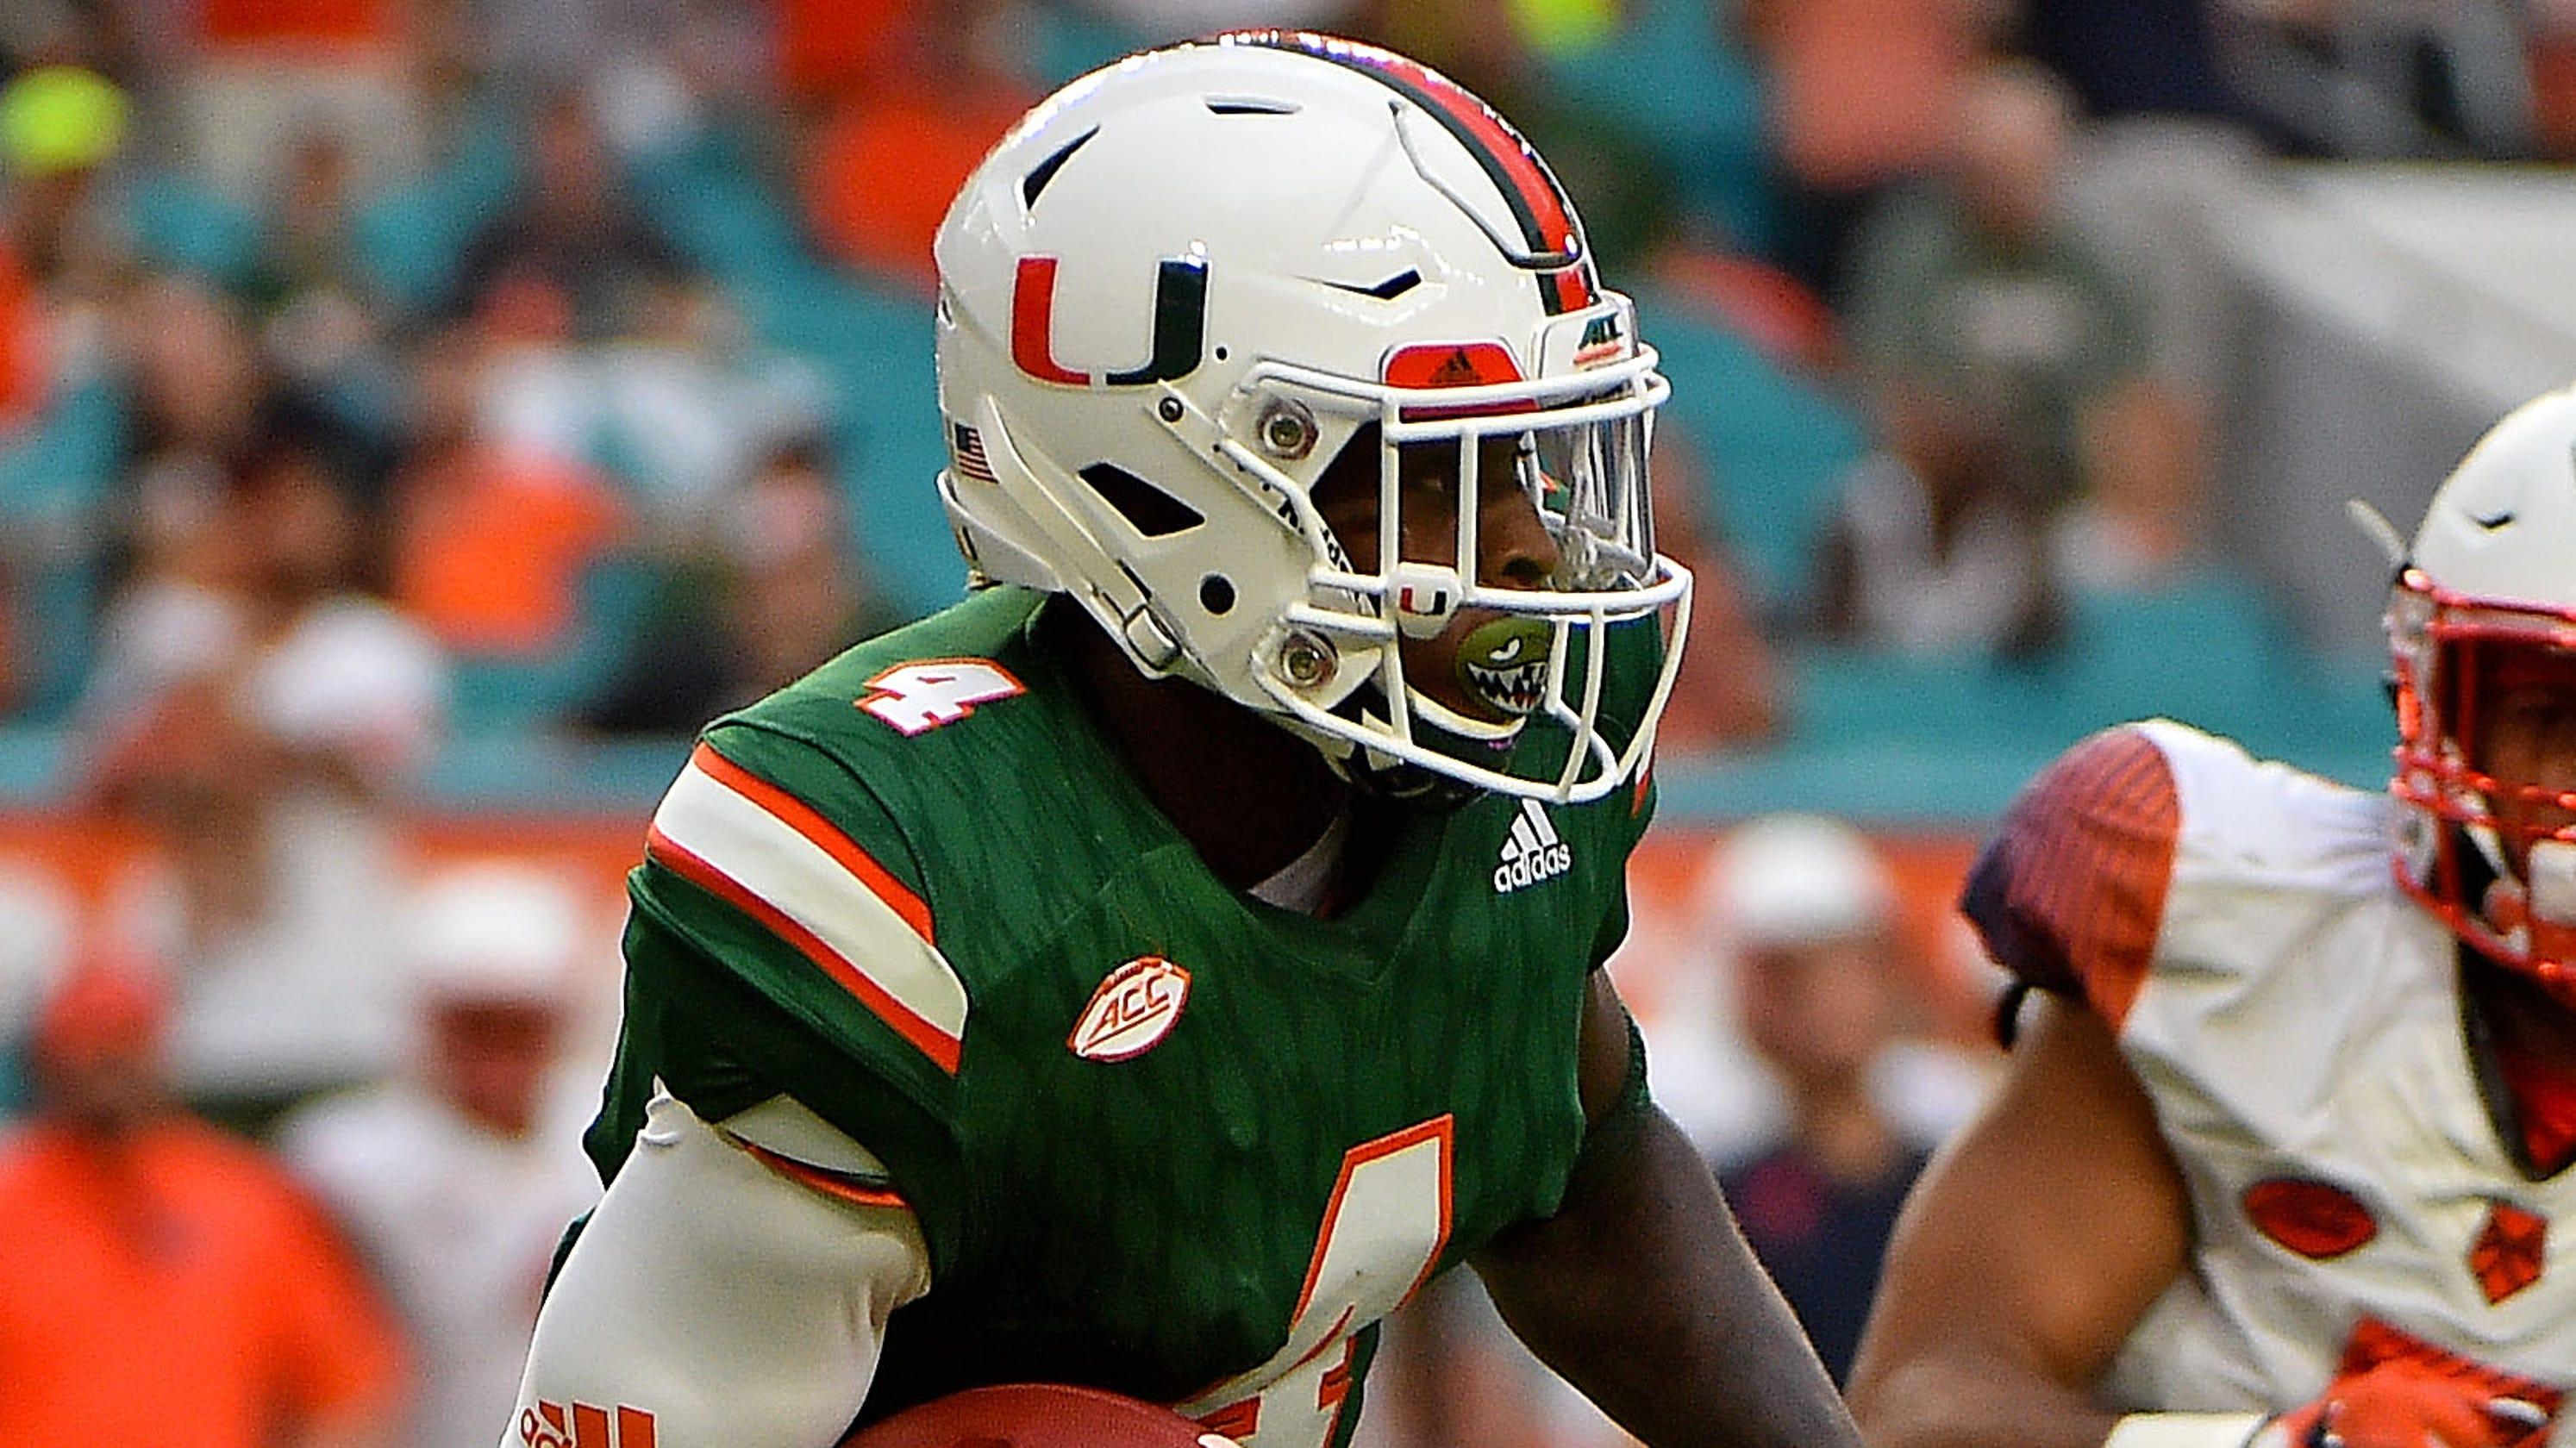 Staff picks for Florida-Miami (Fla.) season opener for college football